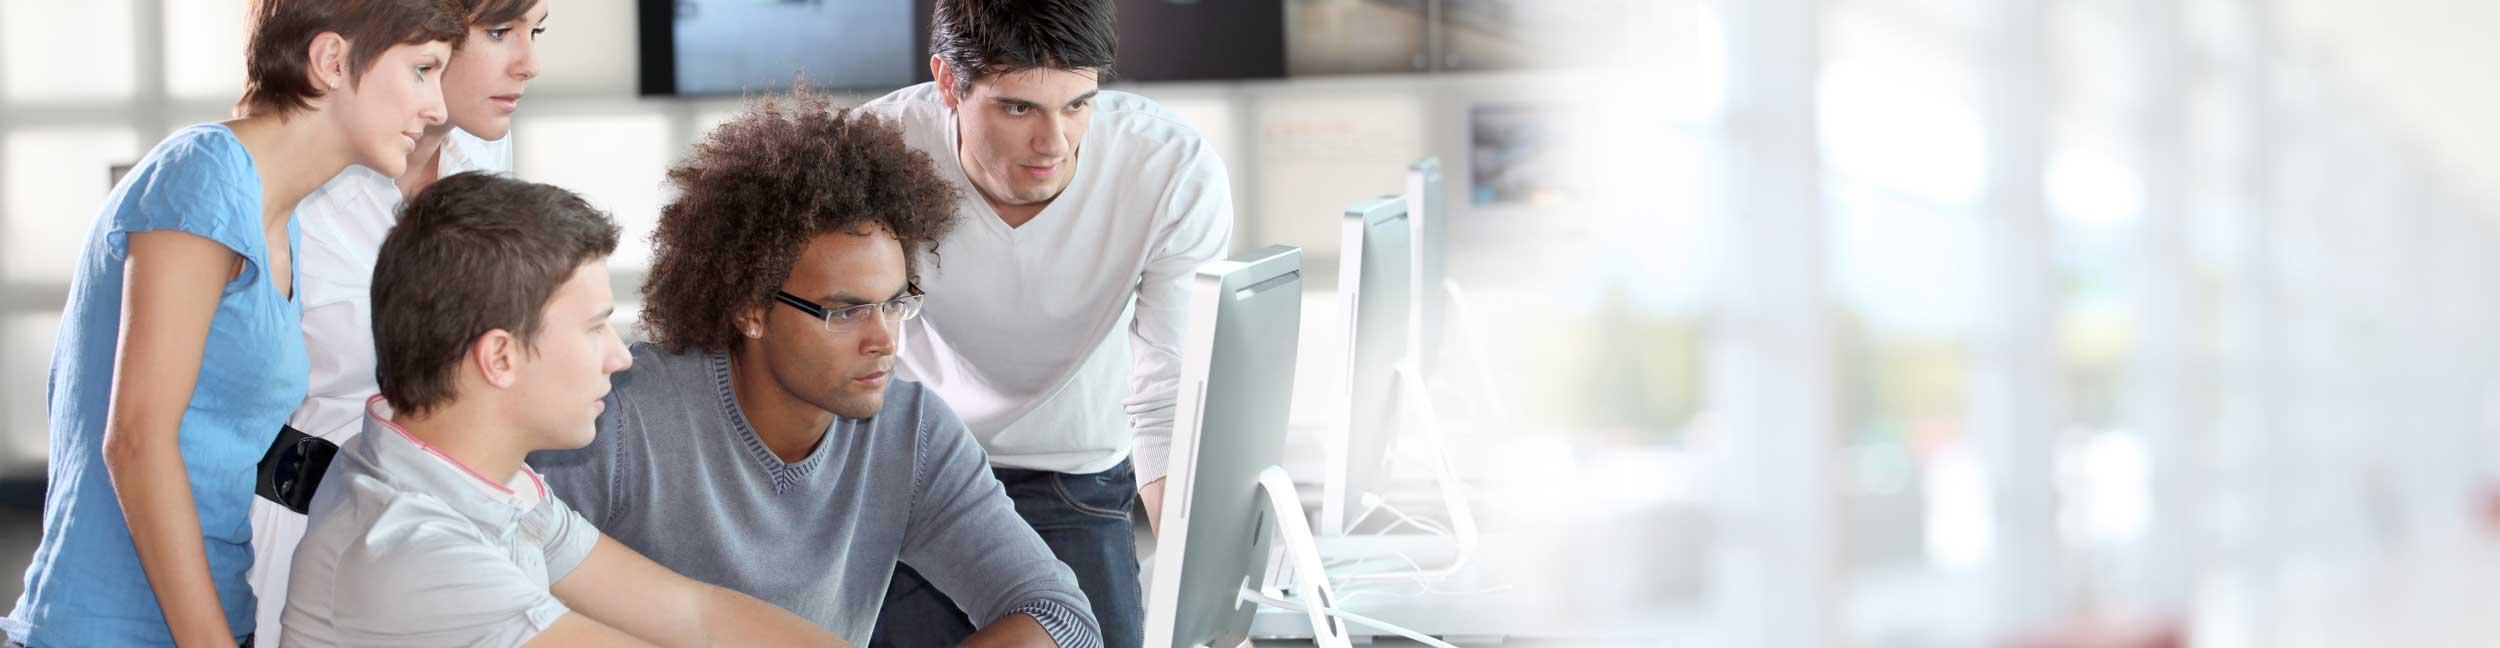 WebCE Company Training Solutions